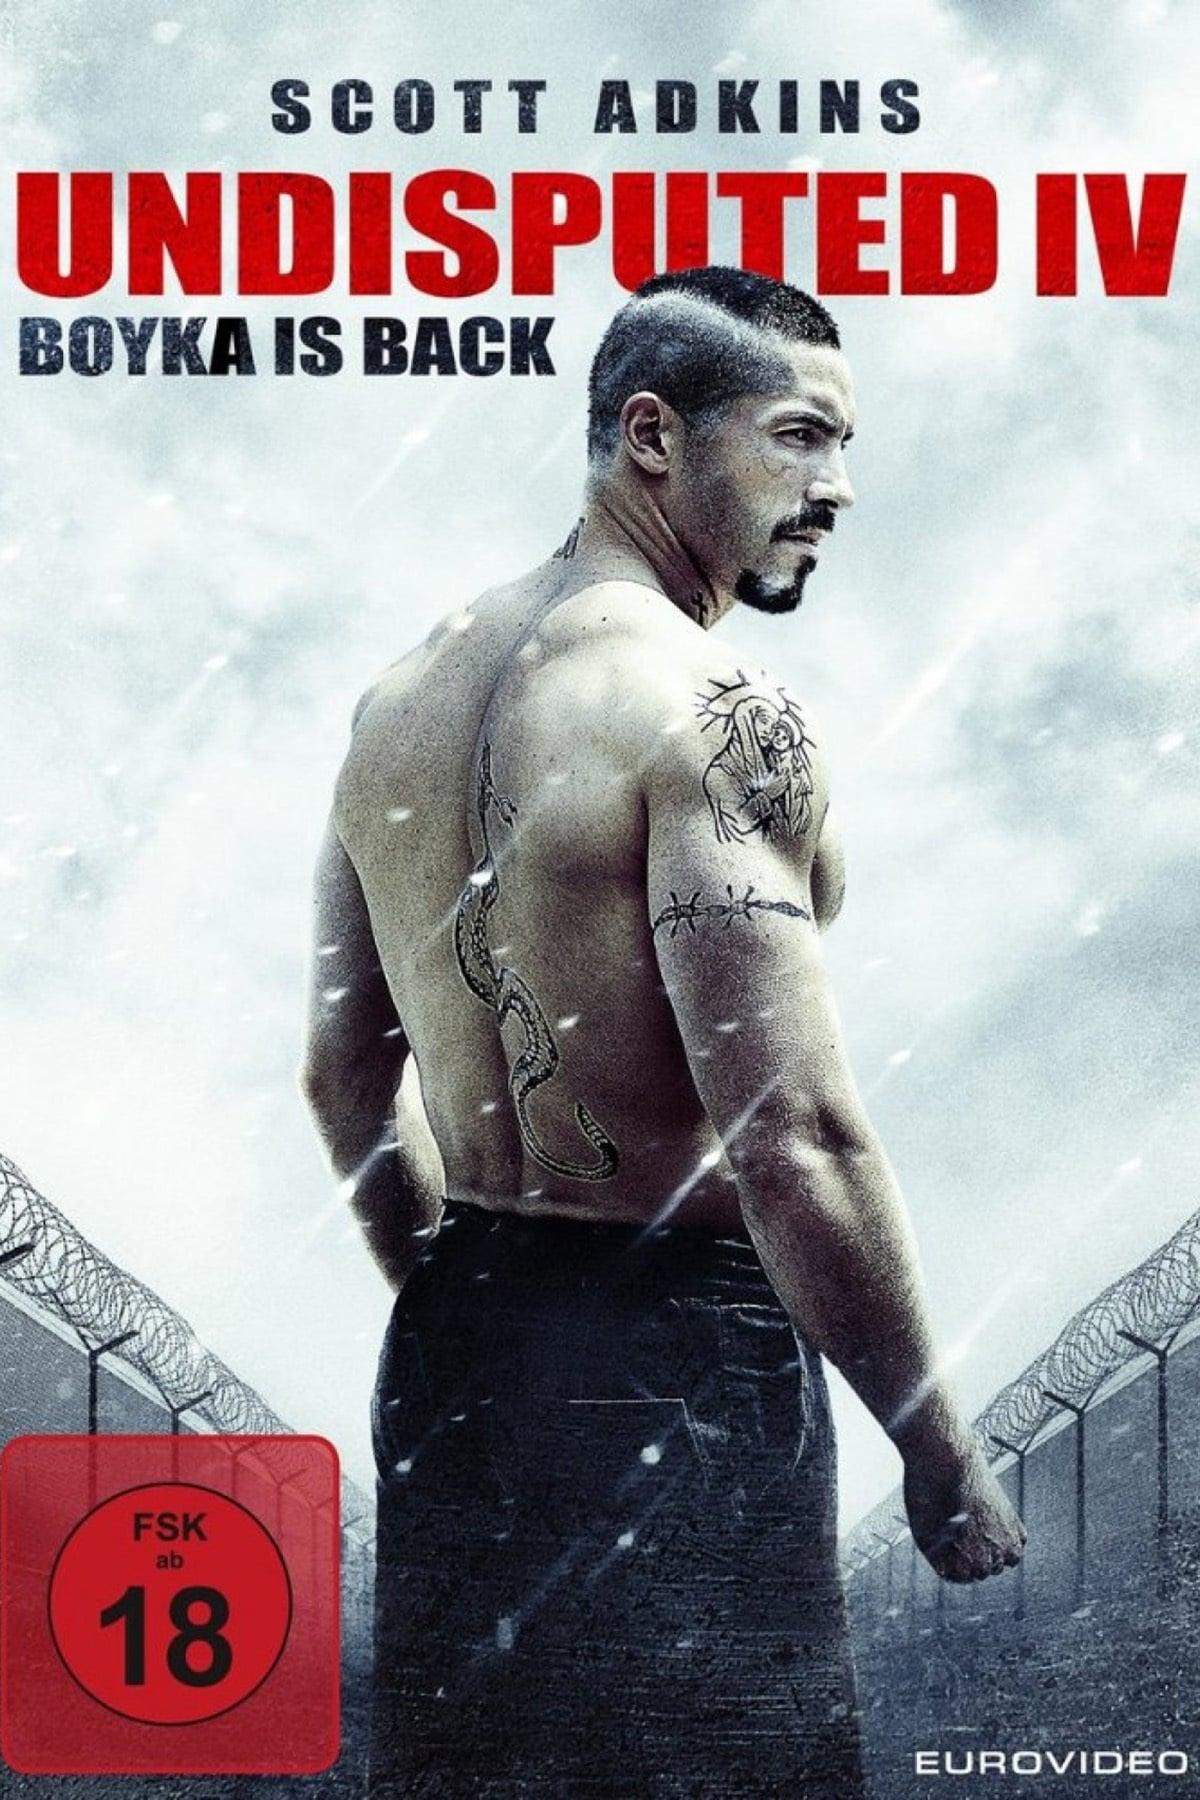 Boyka čempionas: IV / Boyka: Undisputed IV (2016)